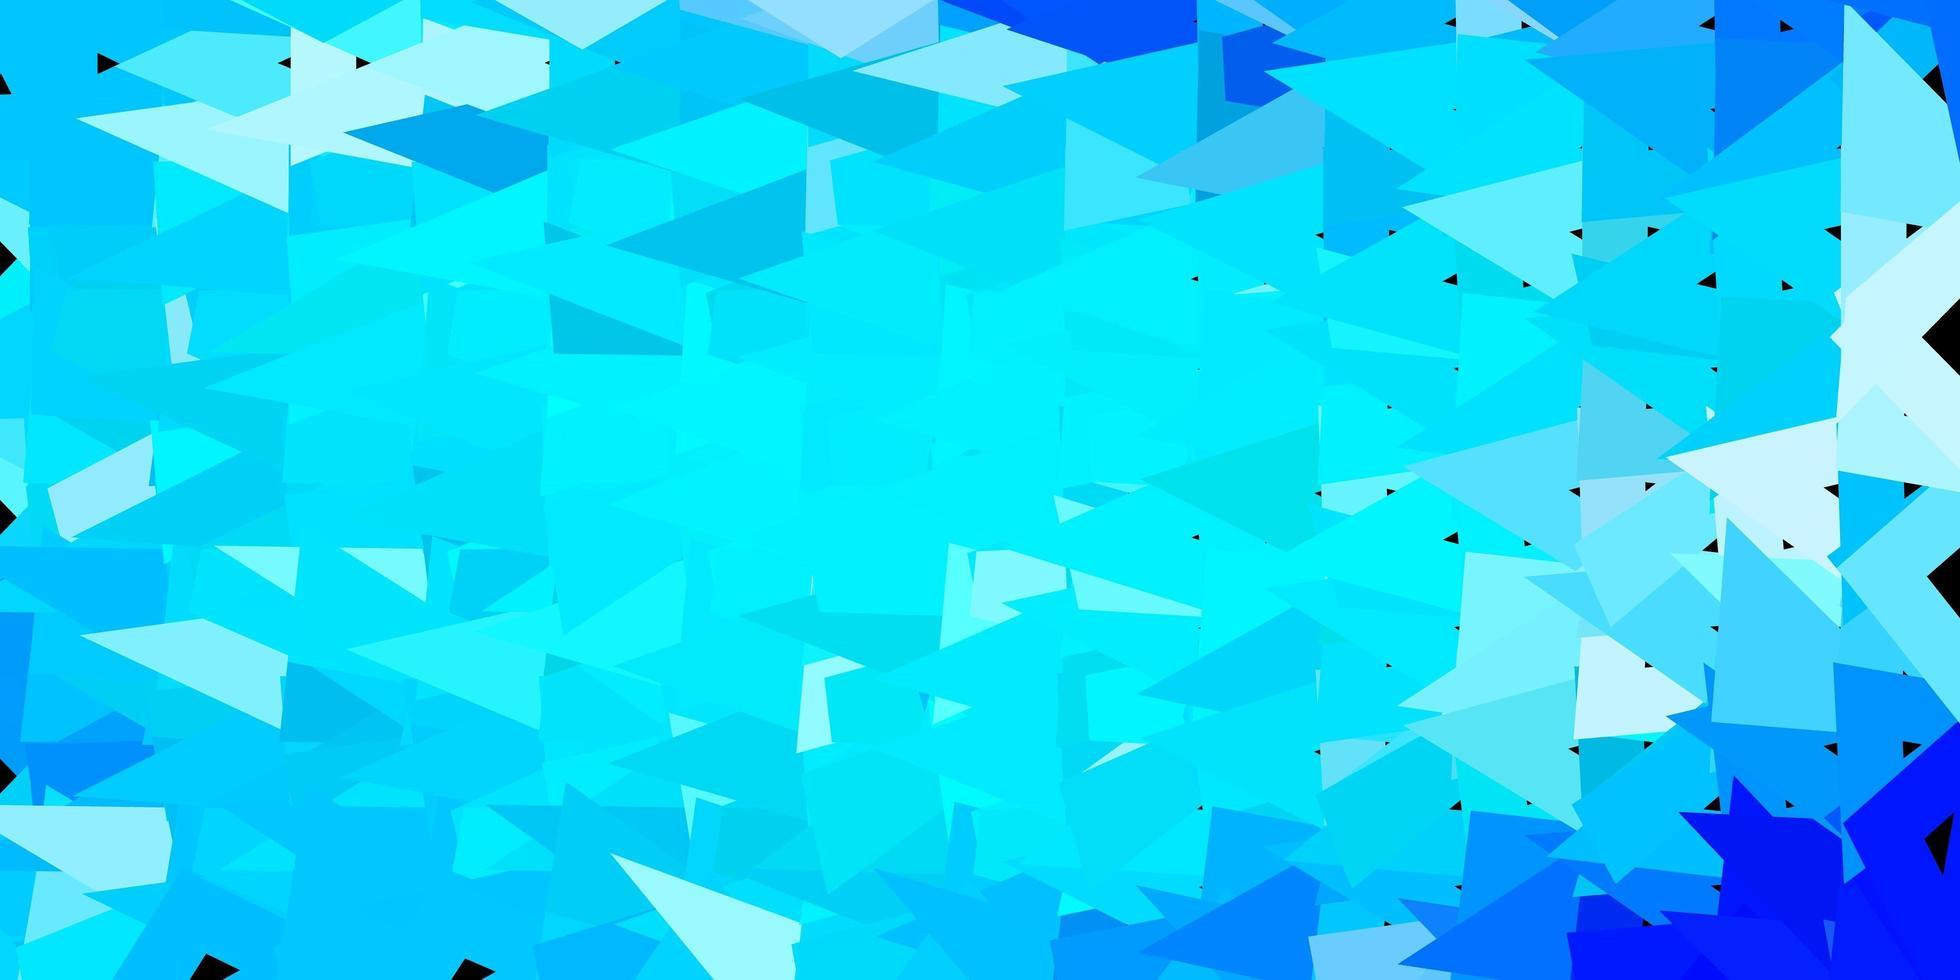 pano de fundo do mosaico do triângulo do vetor azul claro.